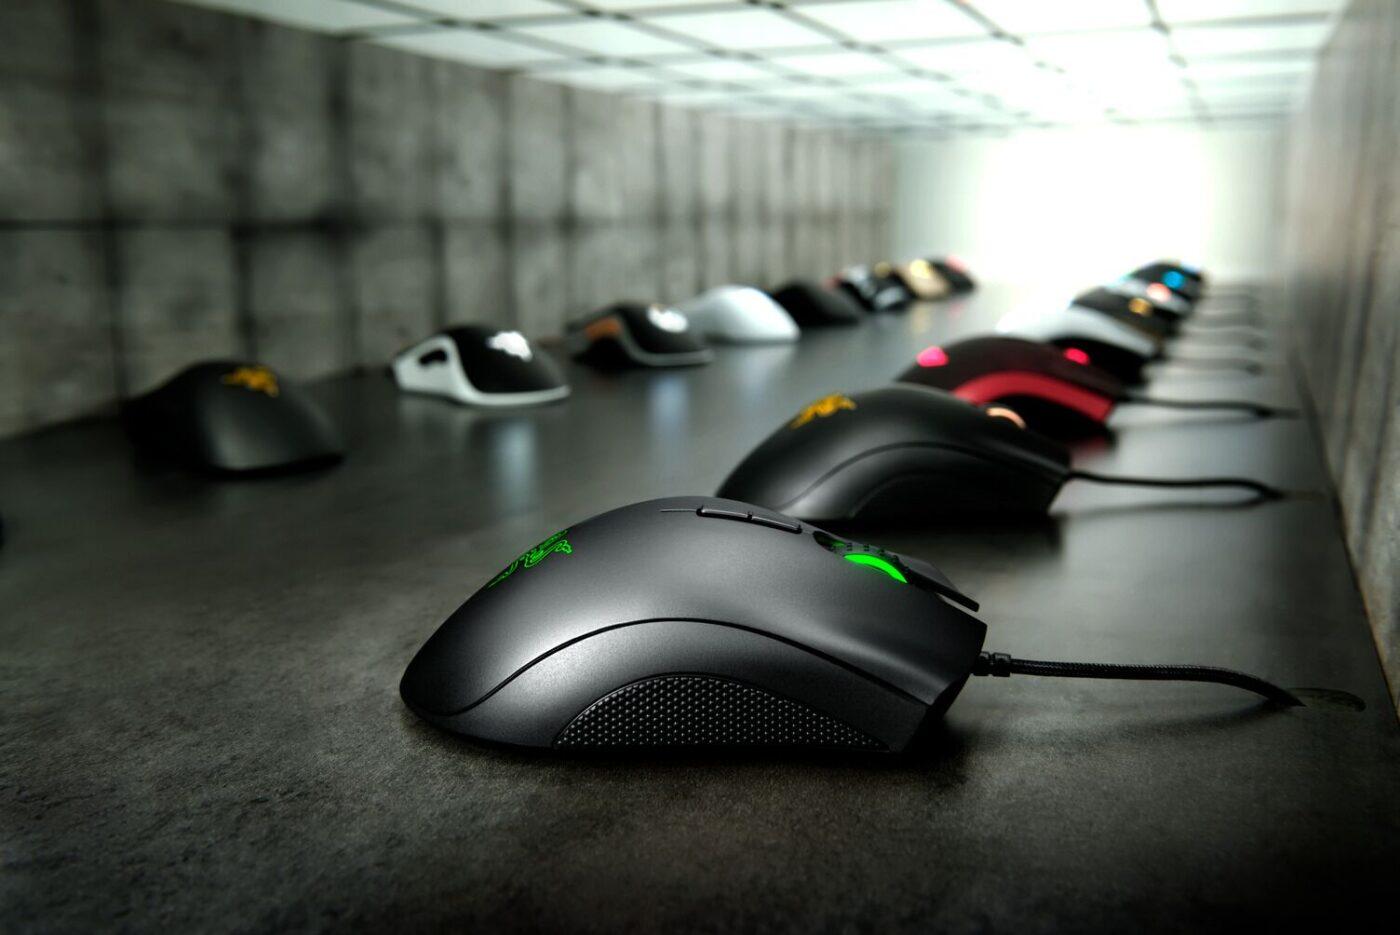 RAZER DEATHADDER Gaming Mouse Reaches Crazy Milestone